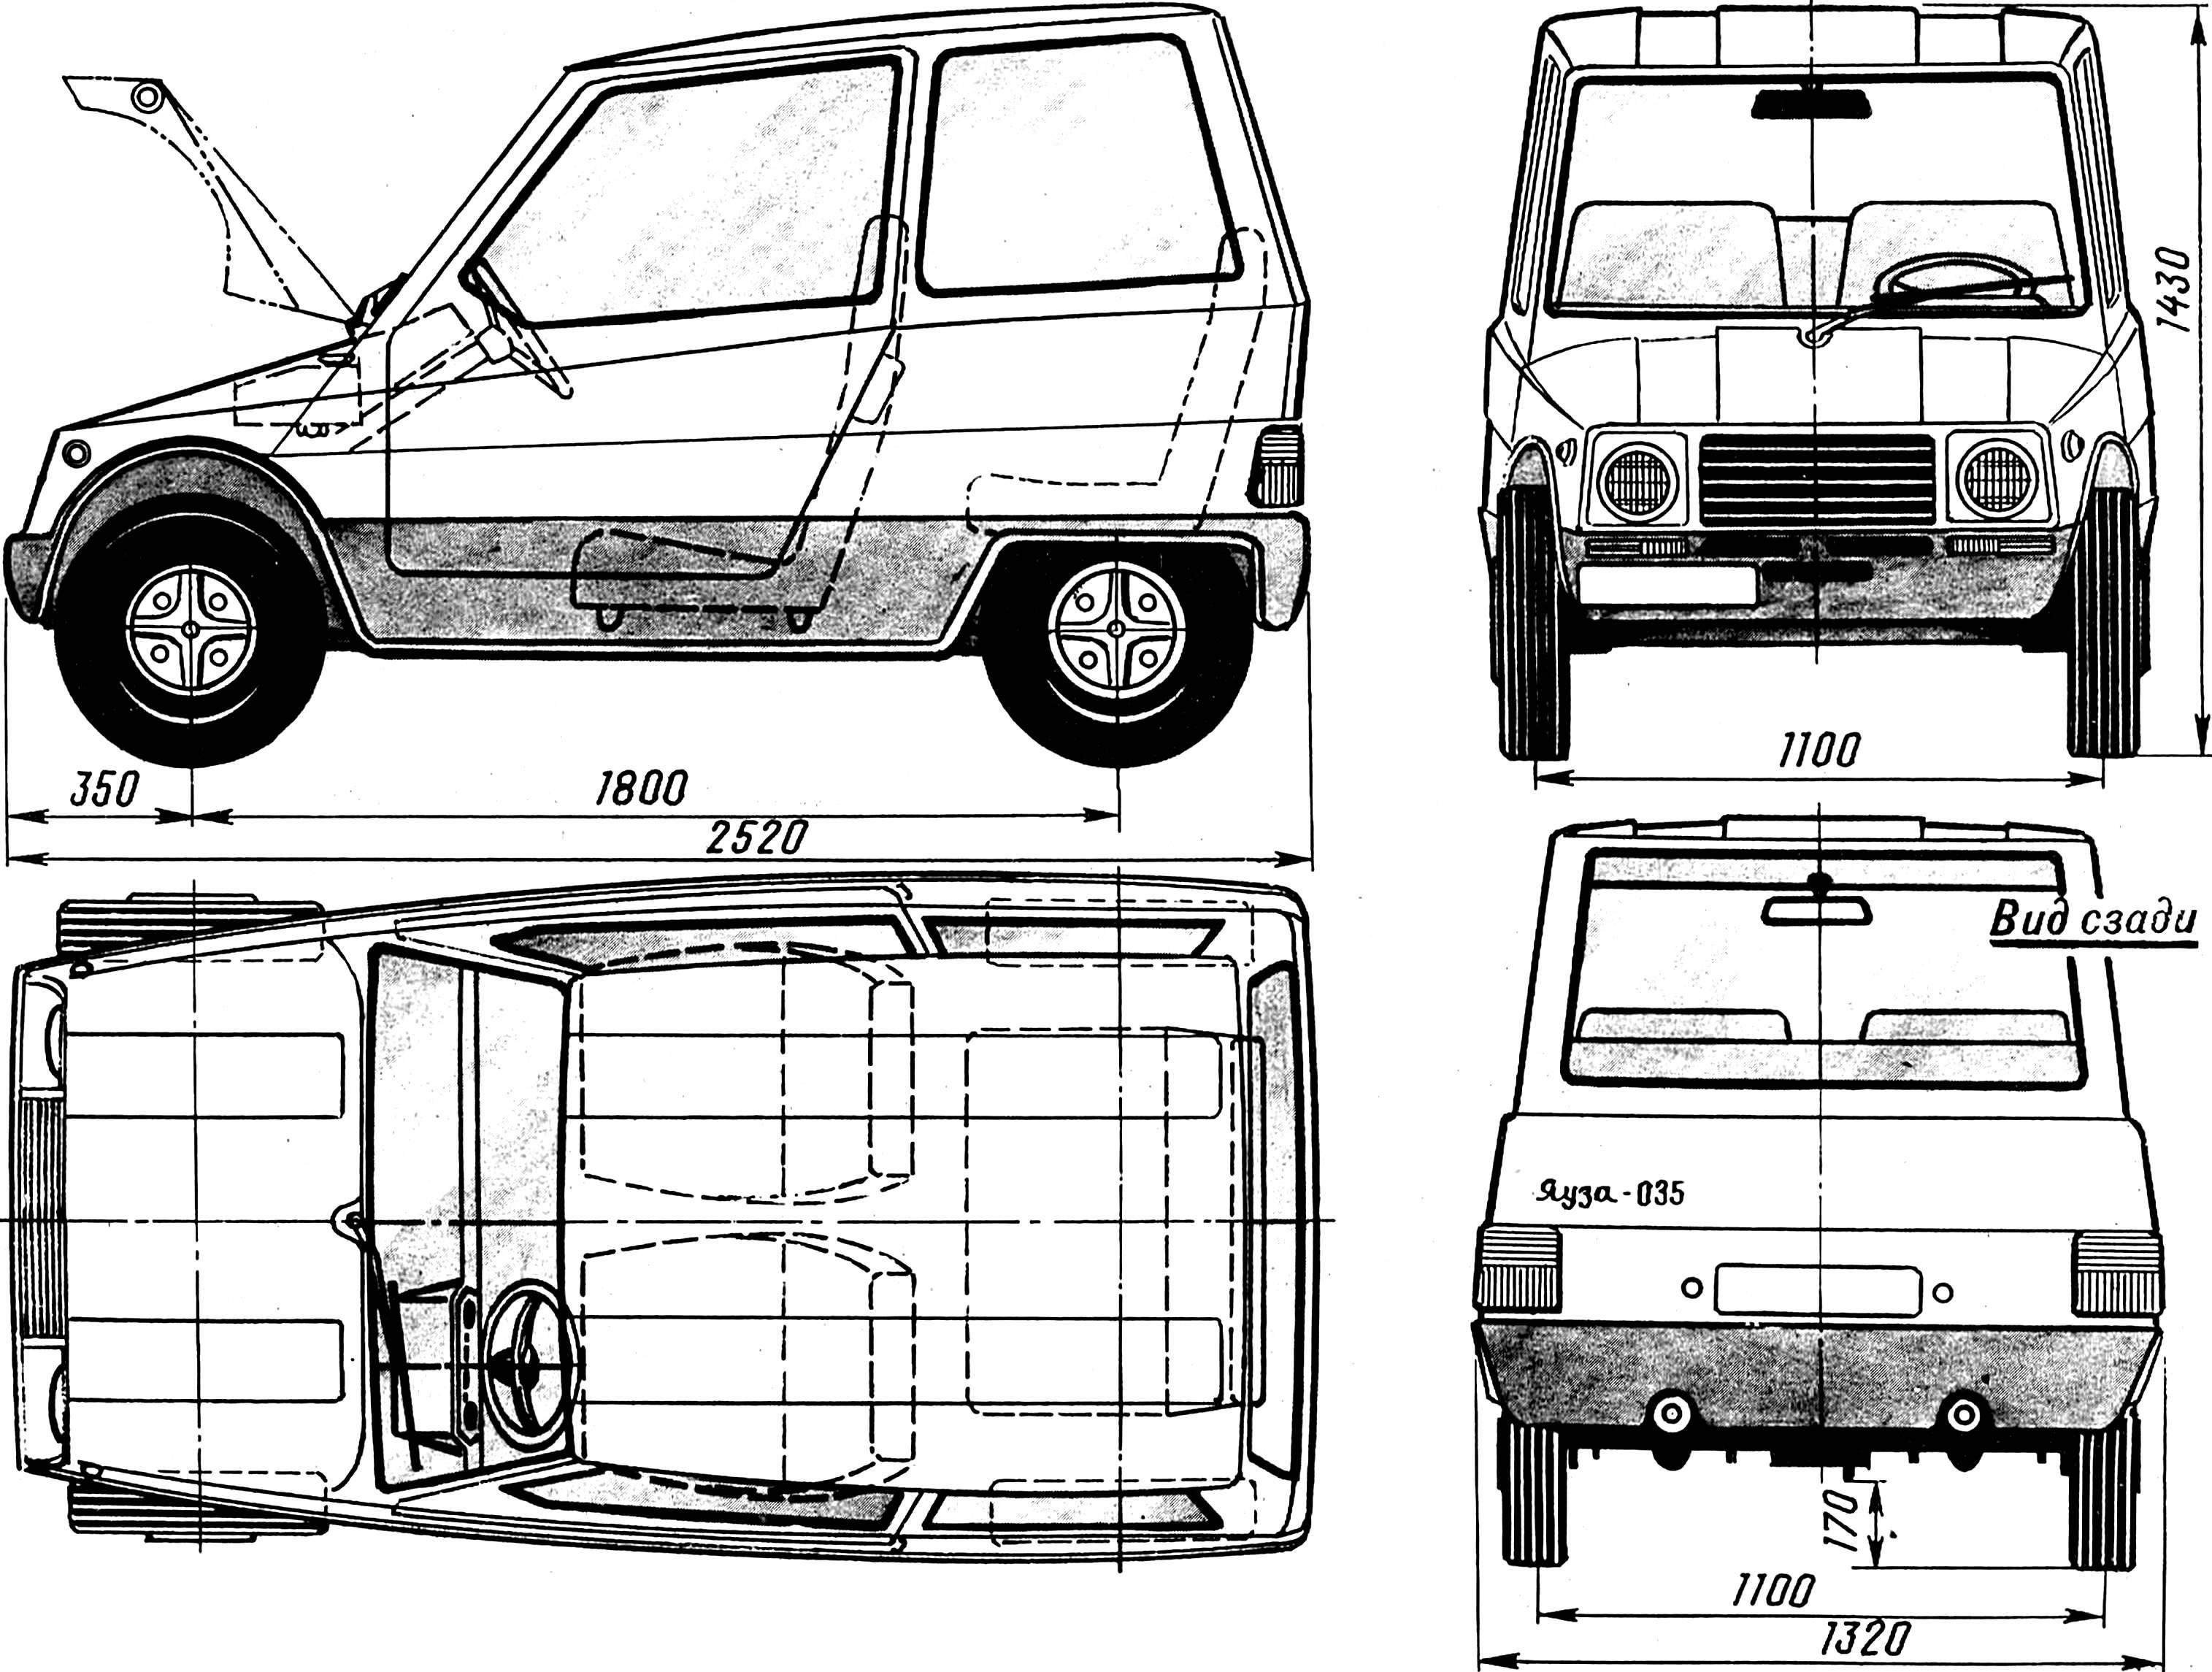 Fig. 1. Subcompact urban vehicle type